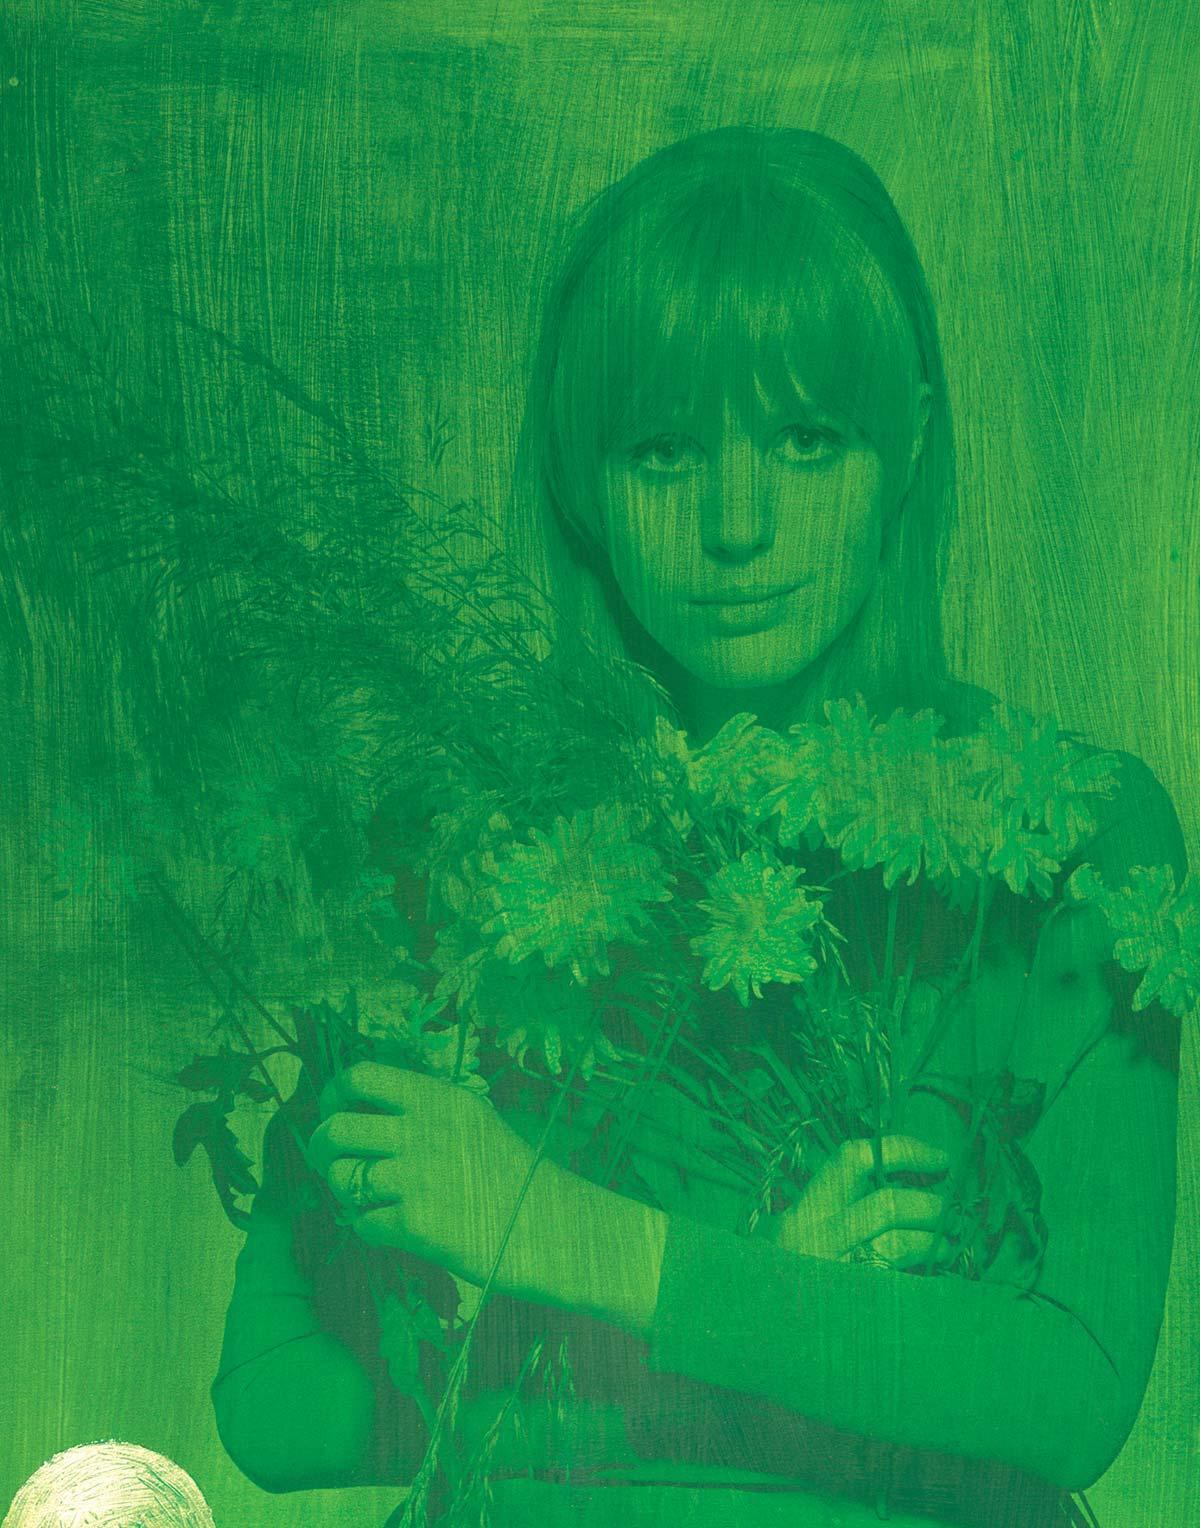 Marianne Flowers – Go Green 2017 featuring Marianne Faithfull